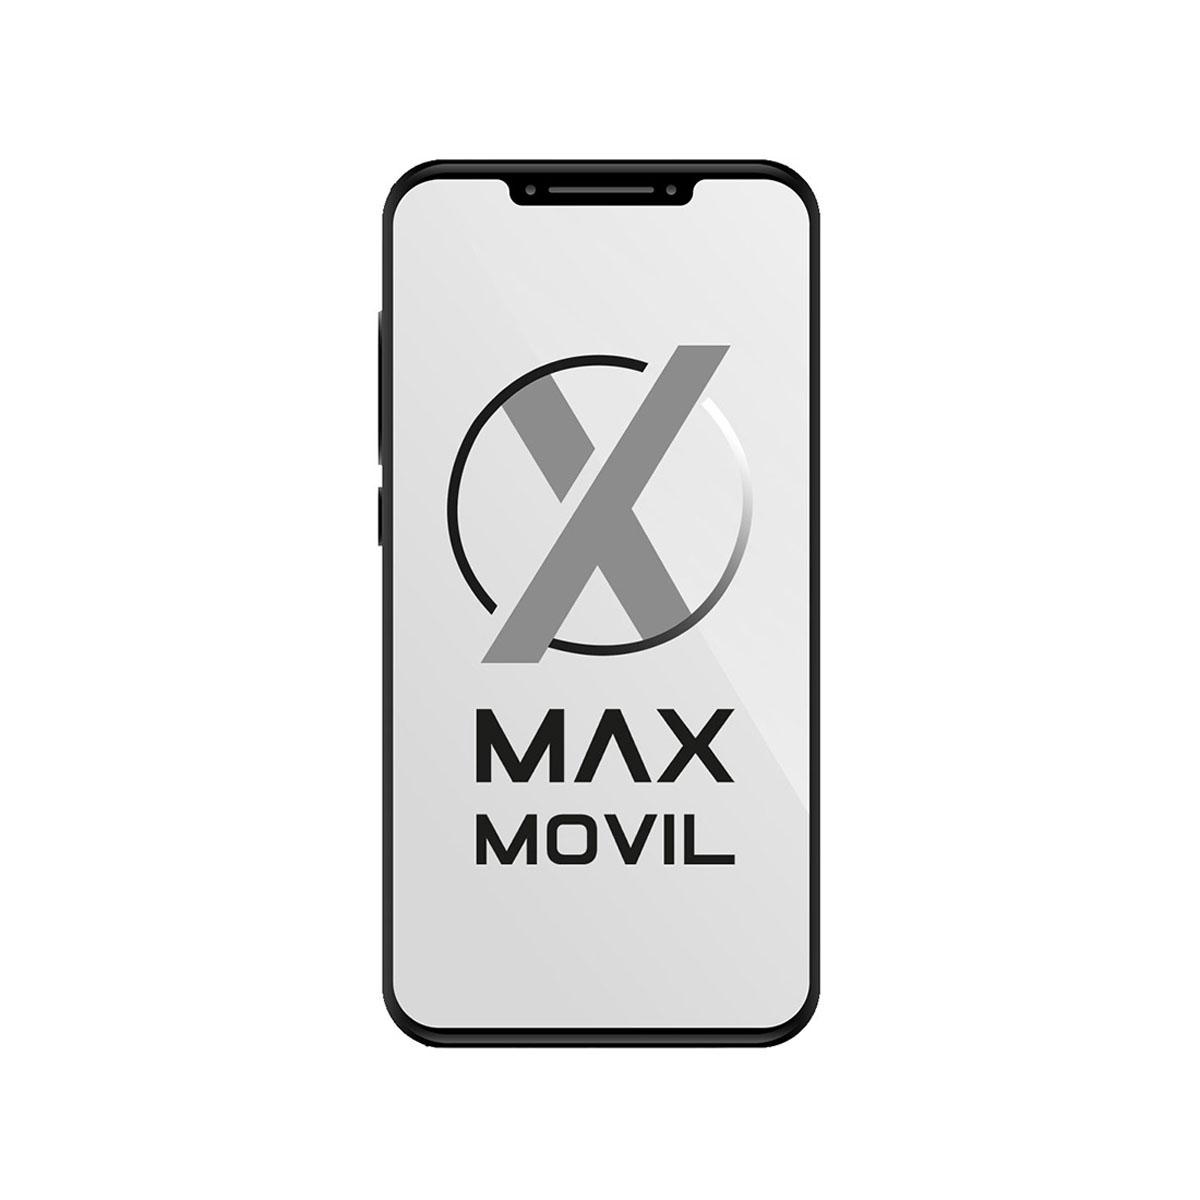 Tablet Lenovo Tab M8 8.0 2GB/32GB WiFi Gris (Platinum Grey) TB-8505FS